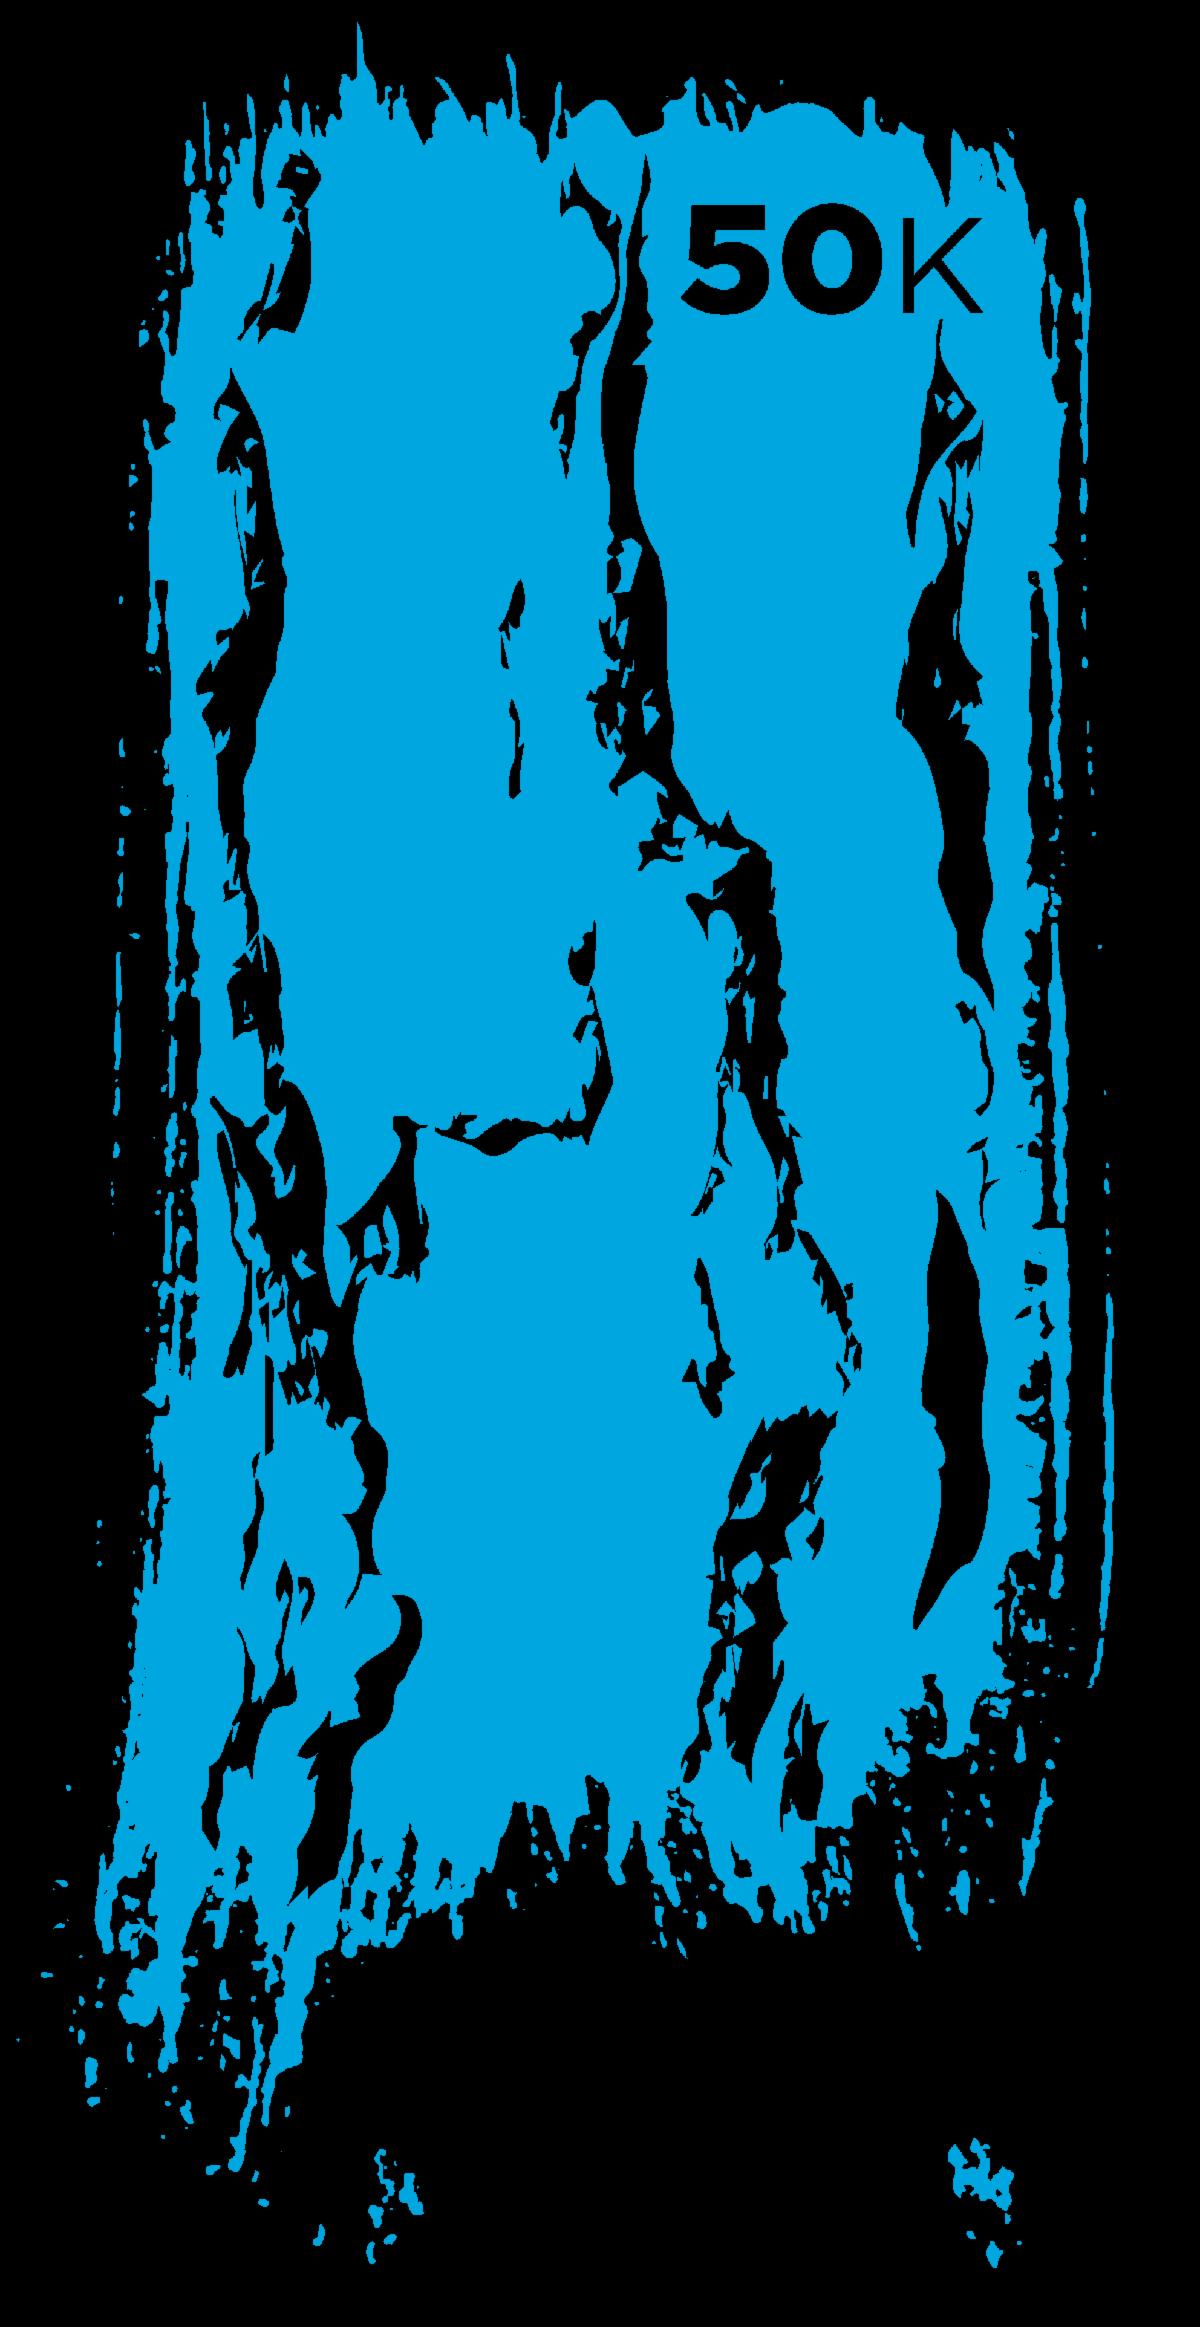 BT50K logo